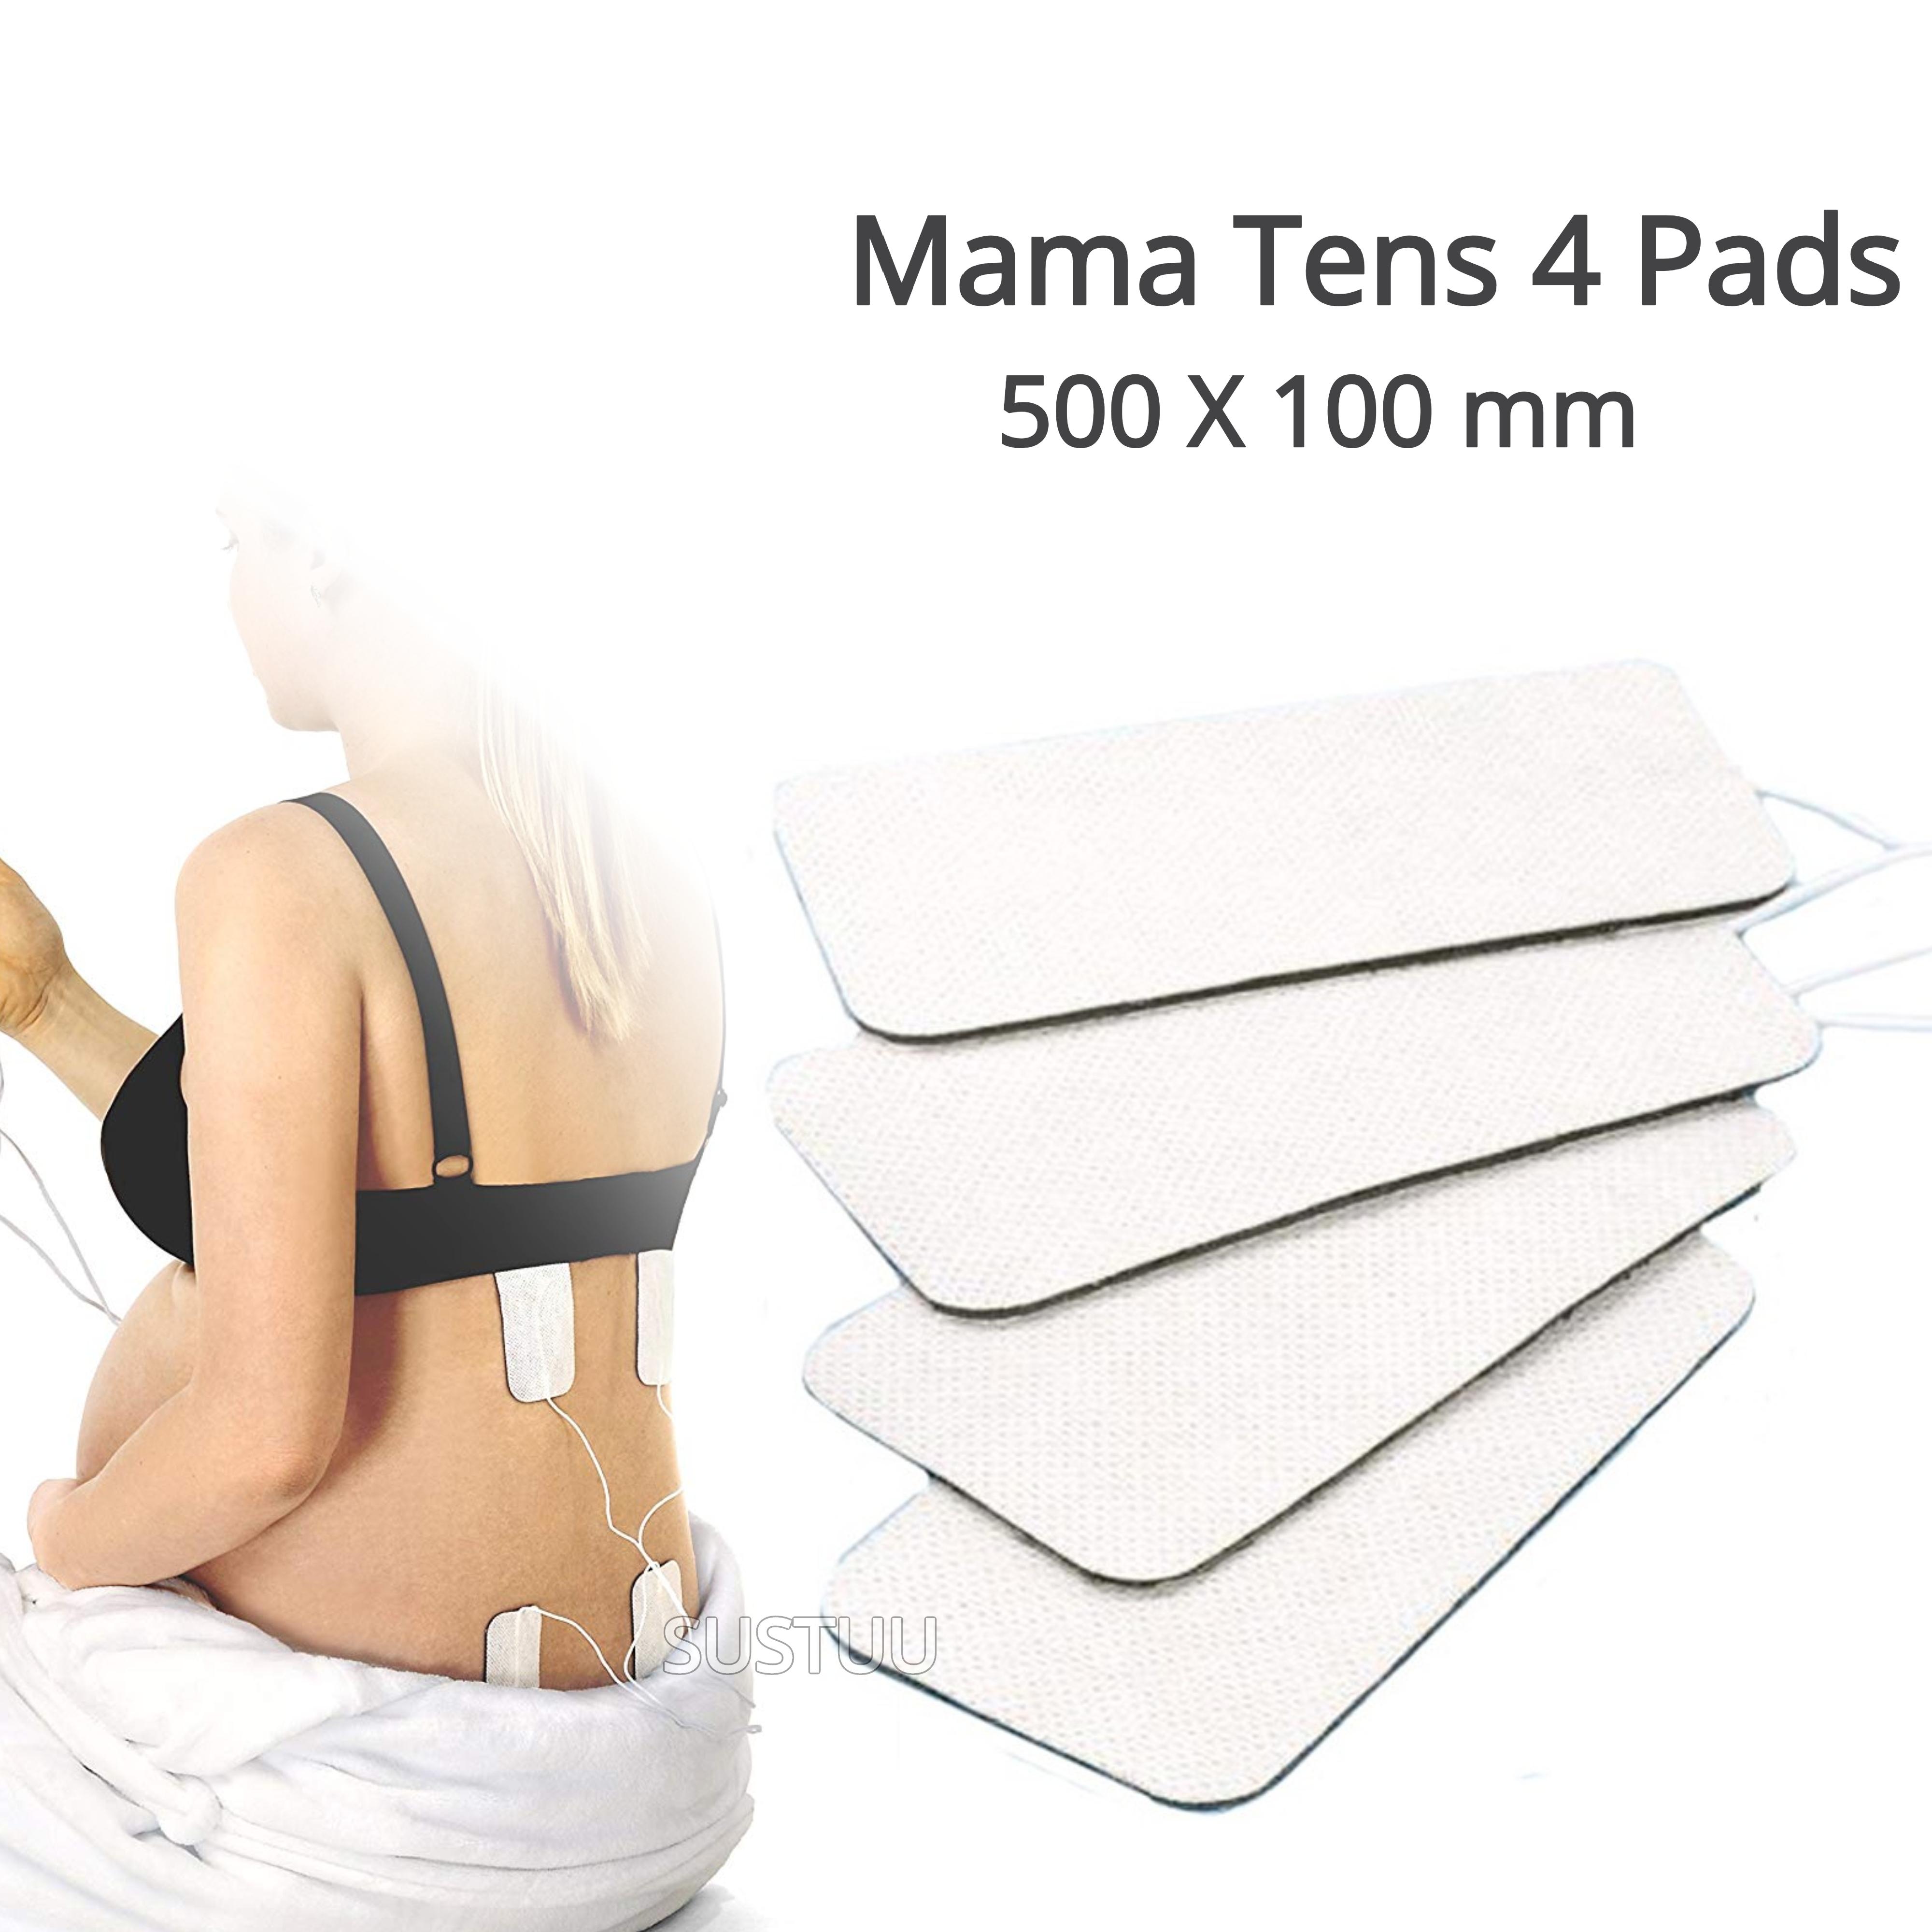 TensCare Mama Tens Pads x 4 | Maternity Unit | Labour Pain Relief | Reusable | 50x100mm